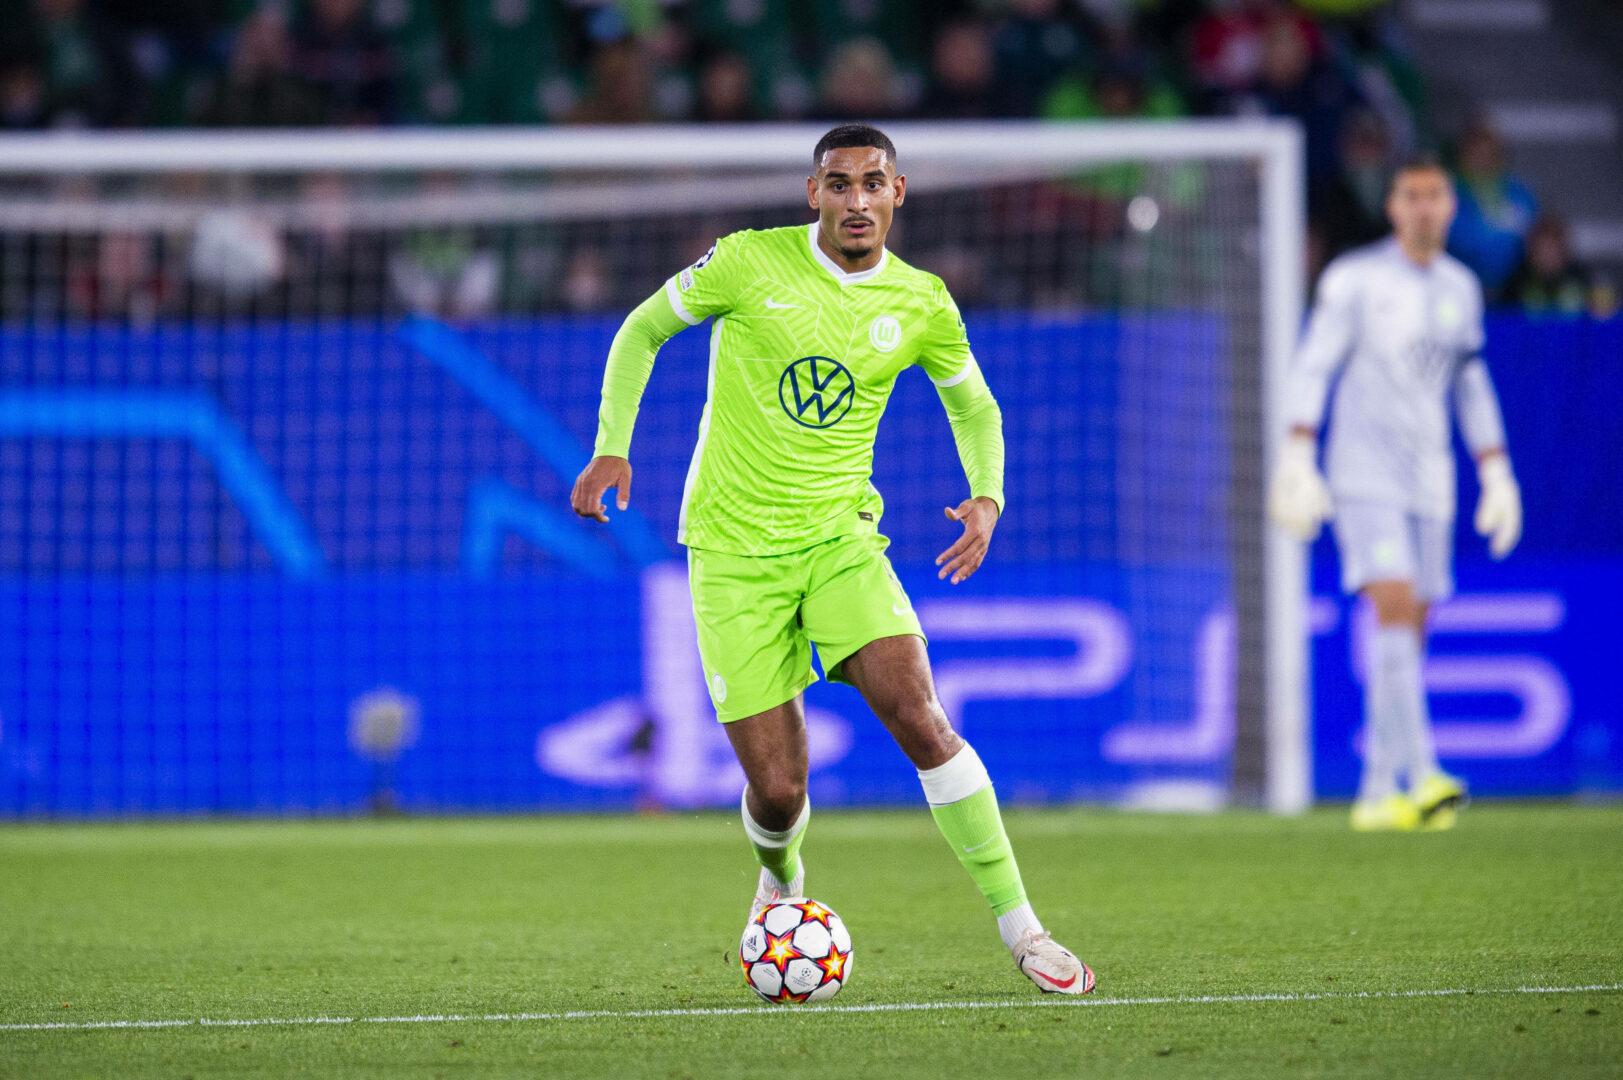 Maxence Lacroix VfL Wolfsburg